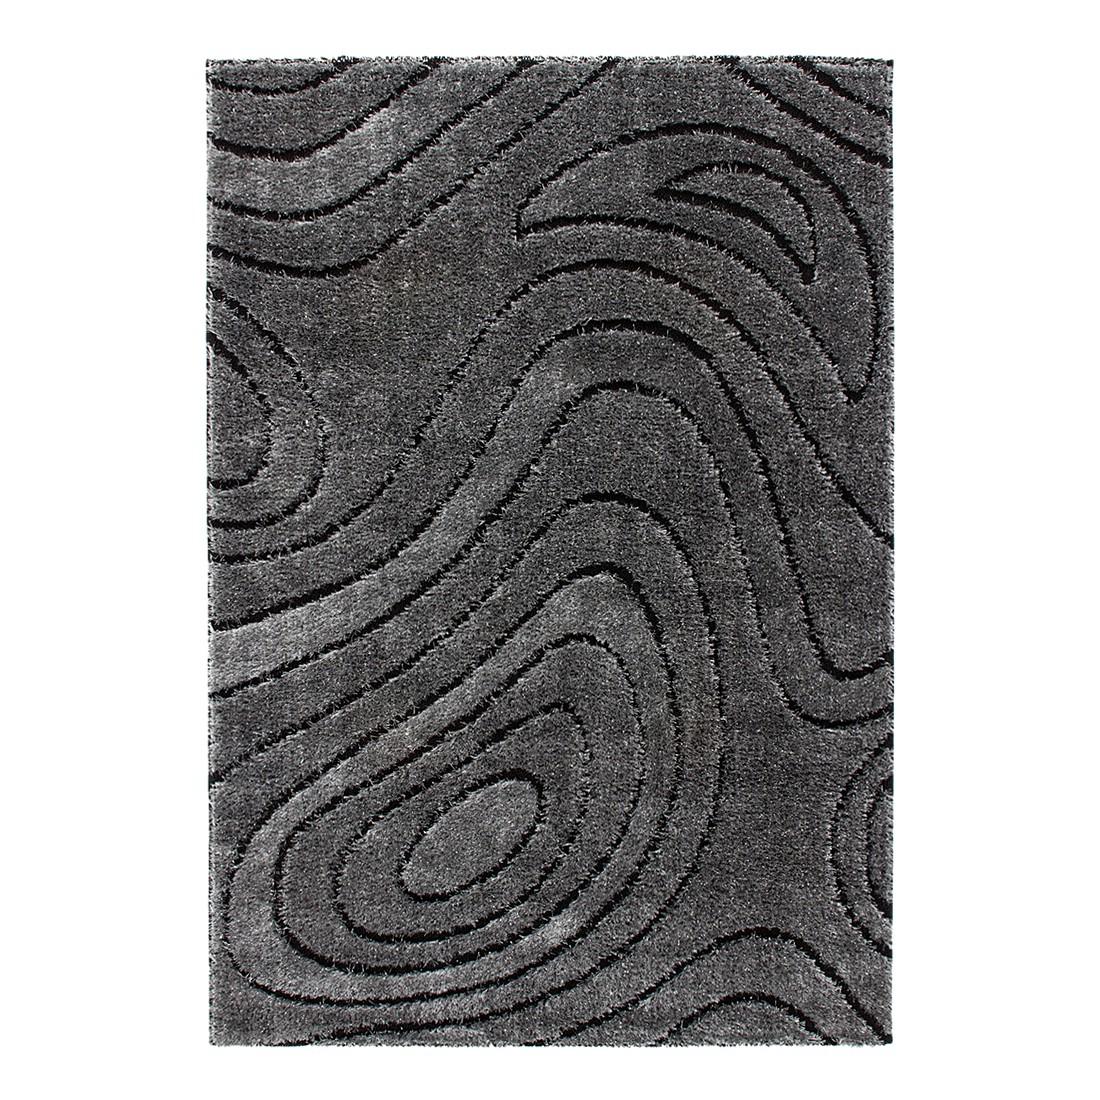 Teppich China – Chongqing – Silber – 80 x 300 cm, Kayoom günstig kaufen